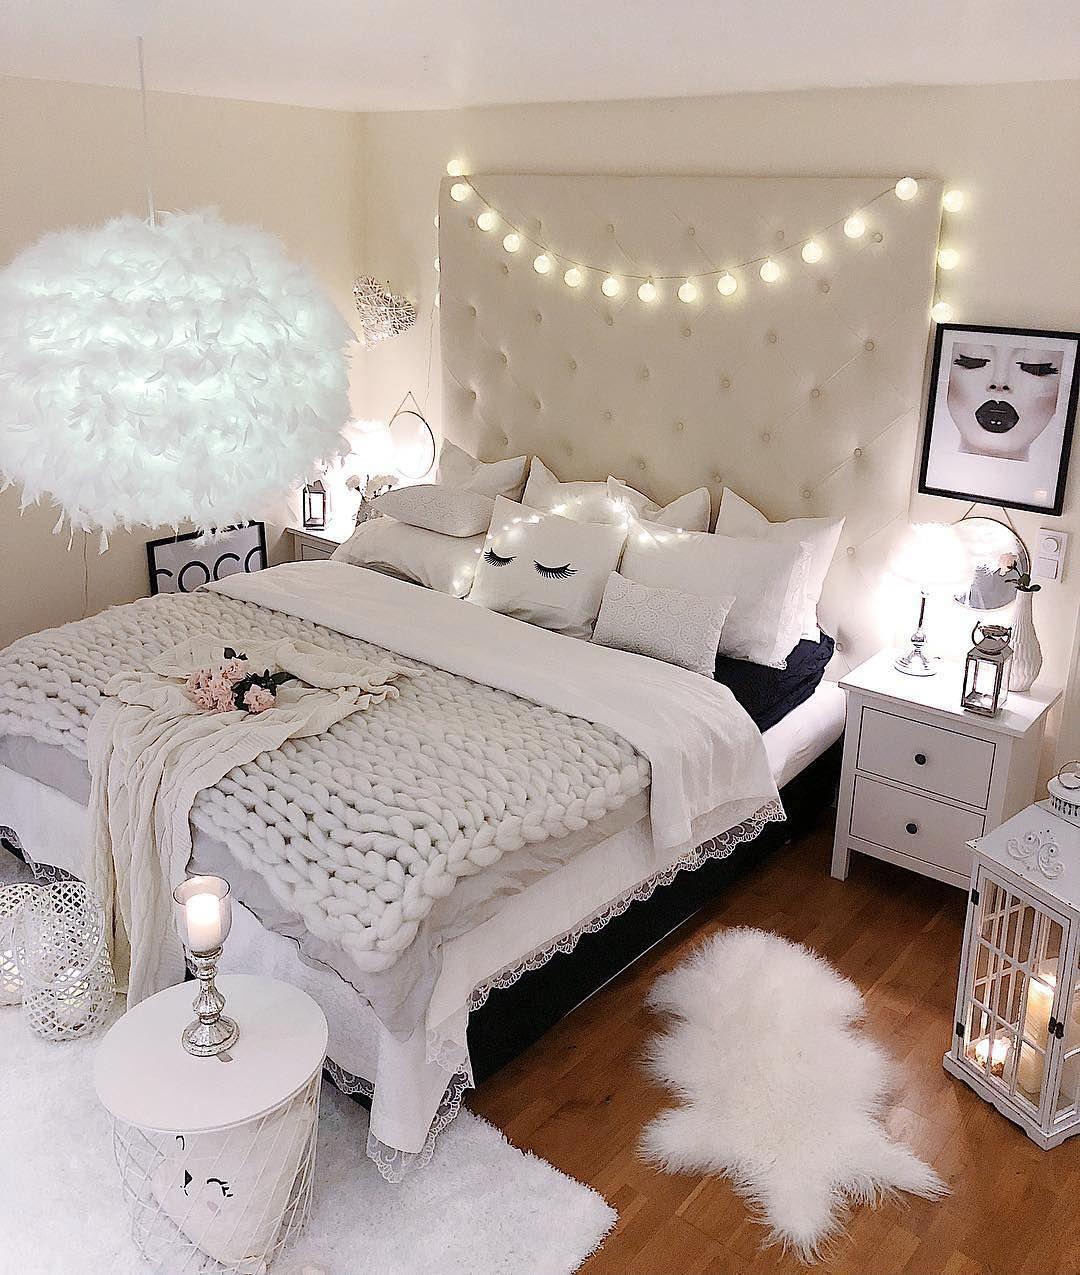 20 Bedroom Chandelier Designs Decorating Ideas: Modern Bedroom Design Ideas. Pale Colors. Contemporary